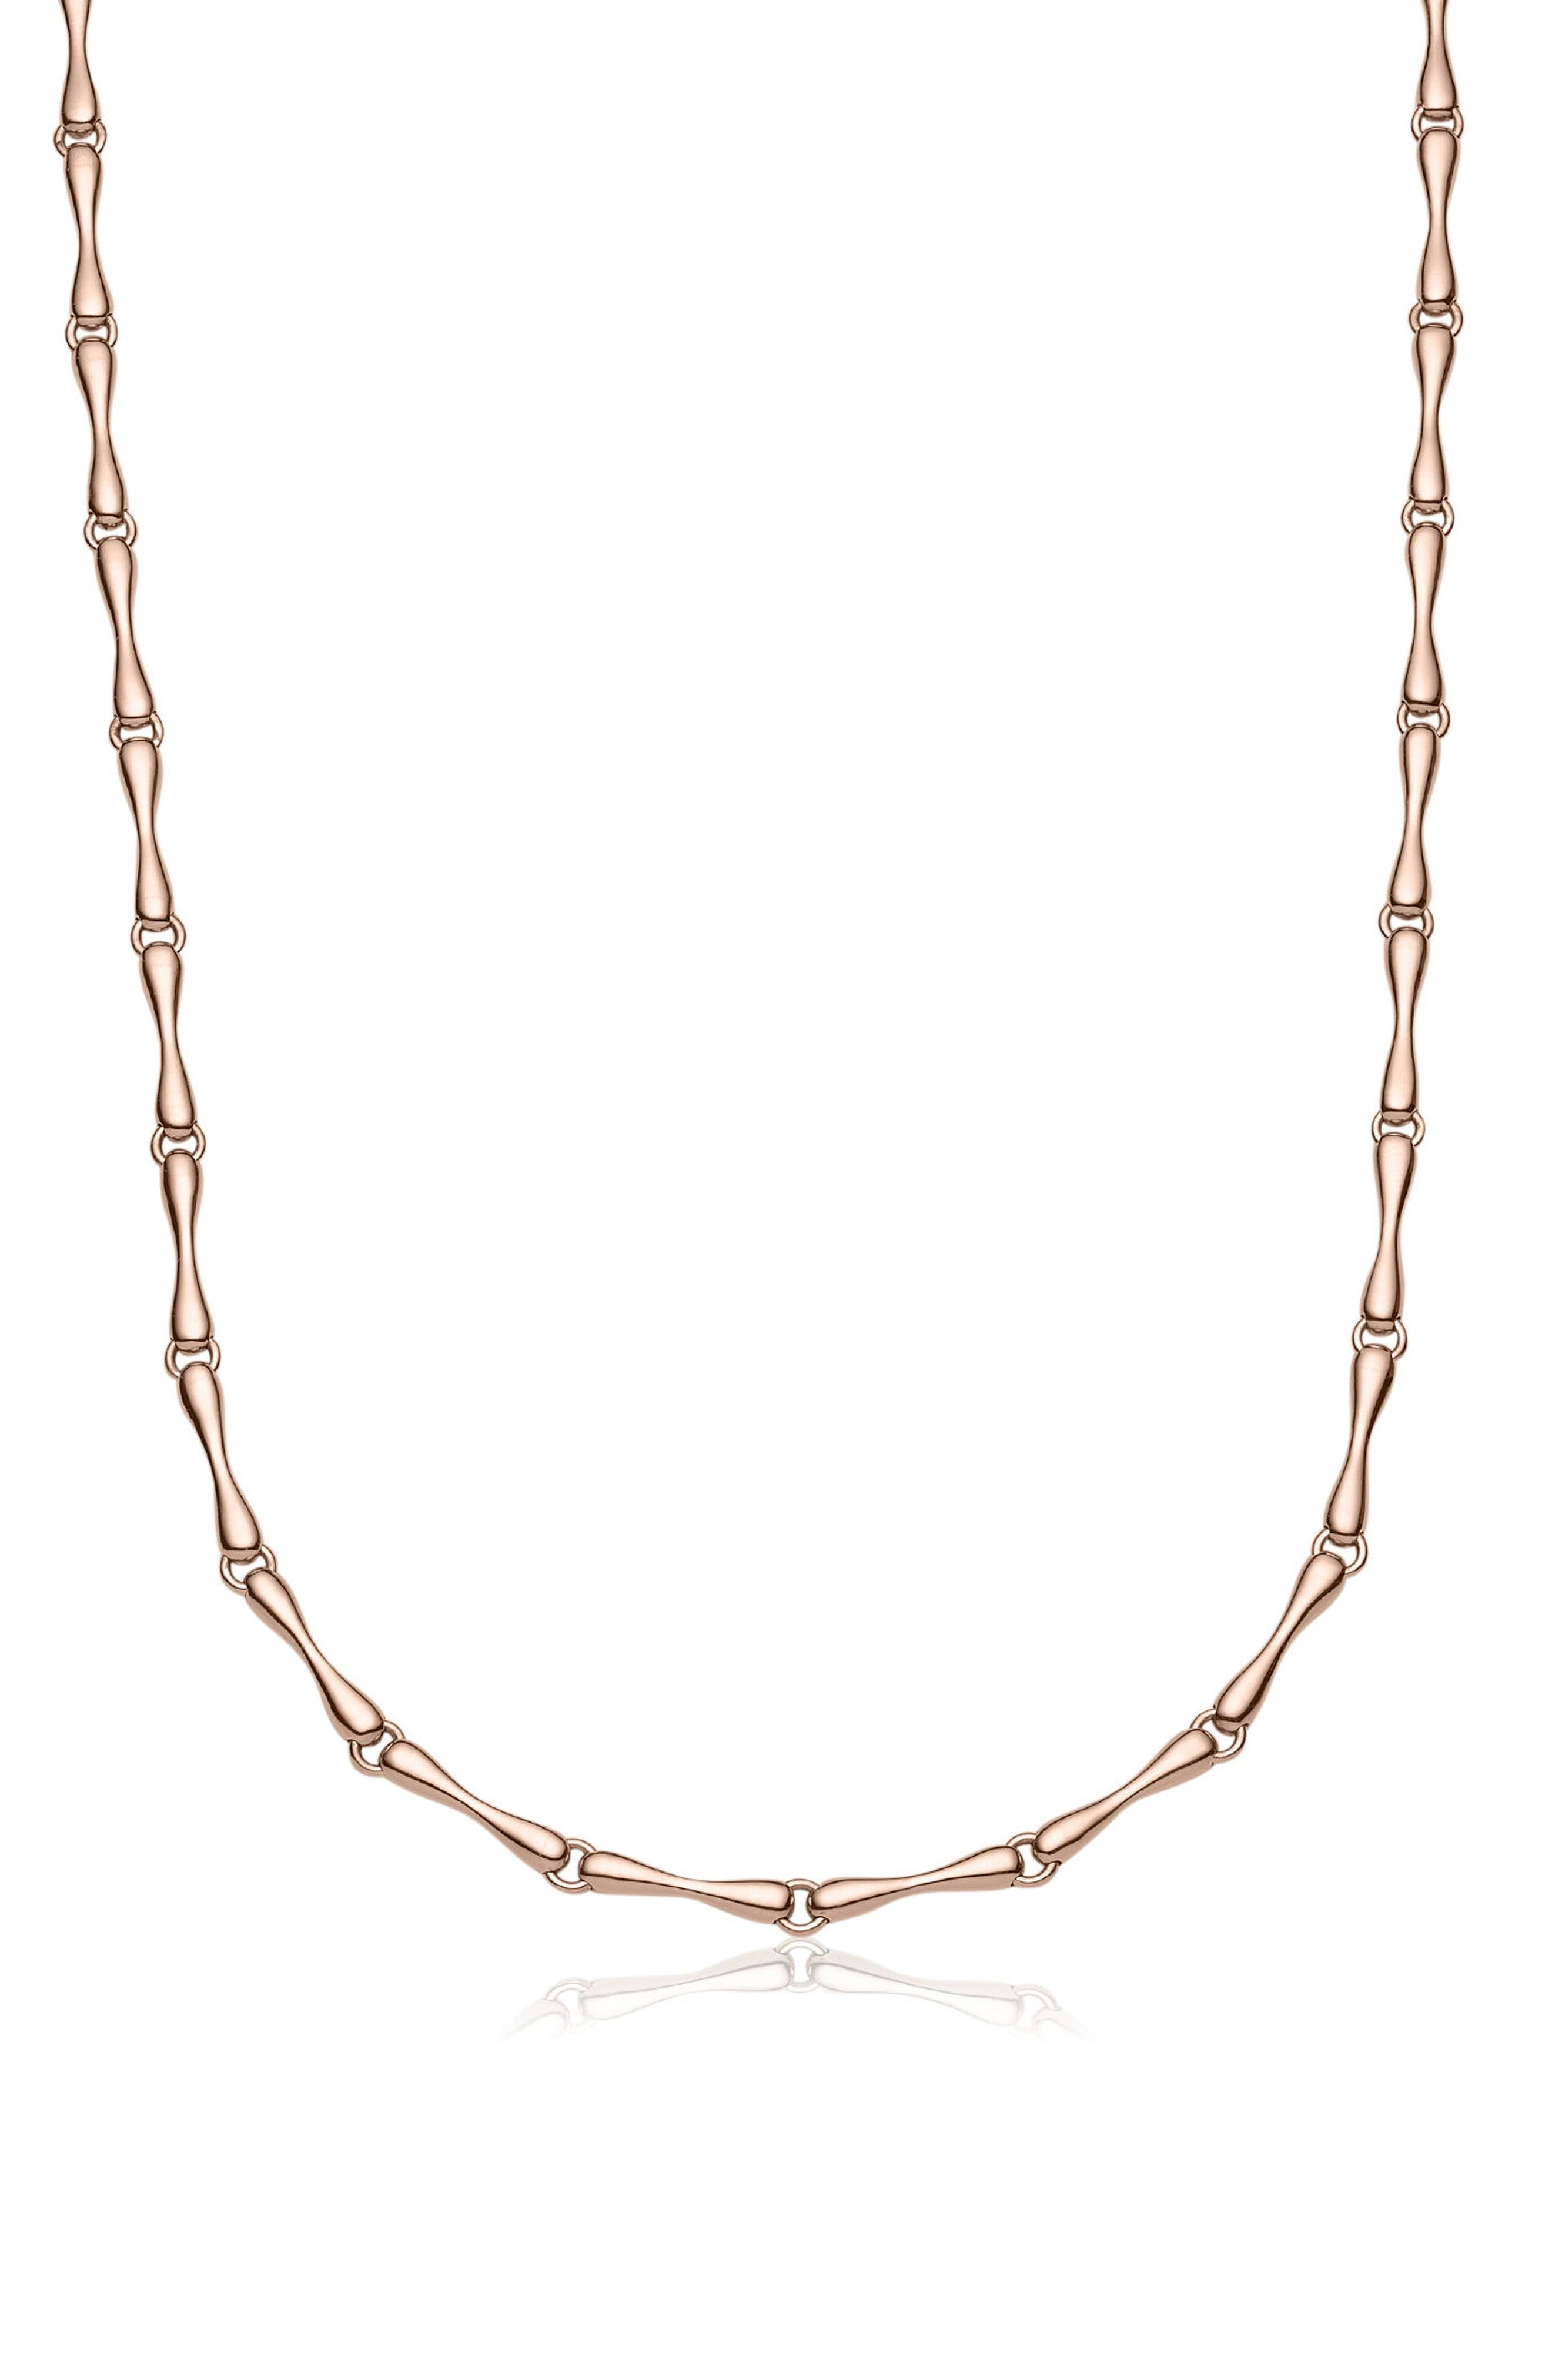 Alternate Image 1 Selected - Monica Vinader Nura Reef Chain Necklace